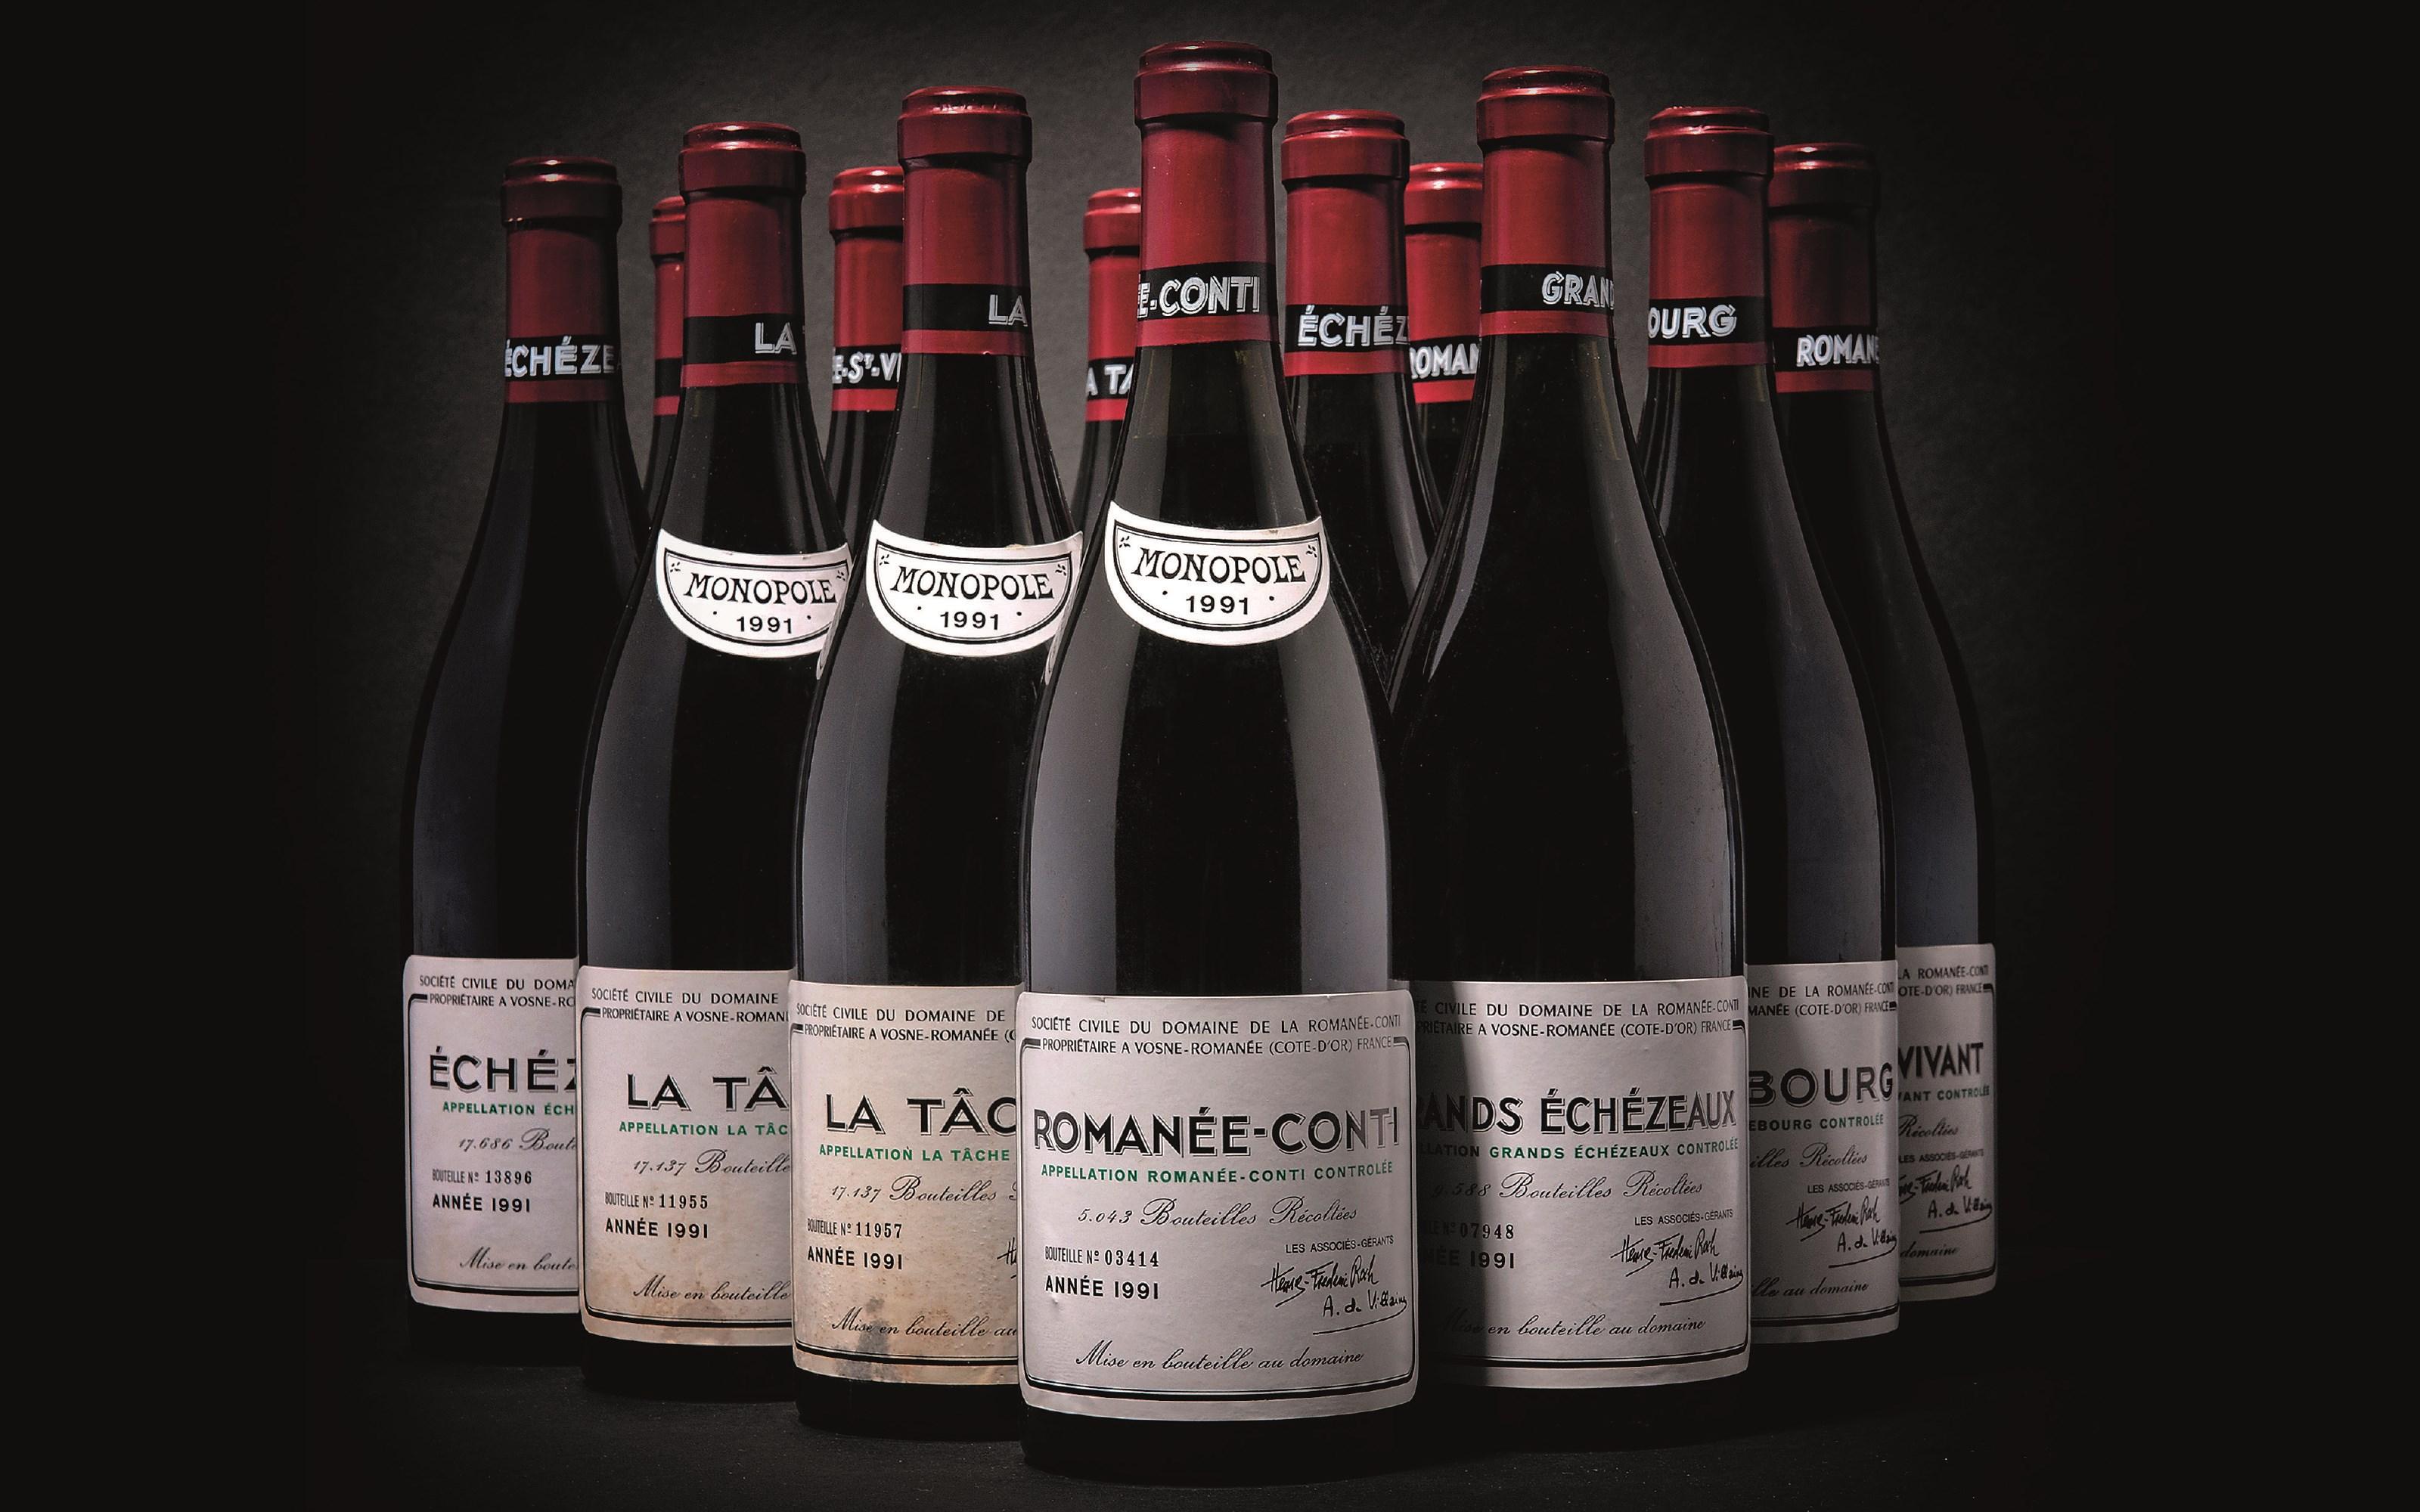 Finest & Rarest Wines & Spirit auction at Christies